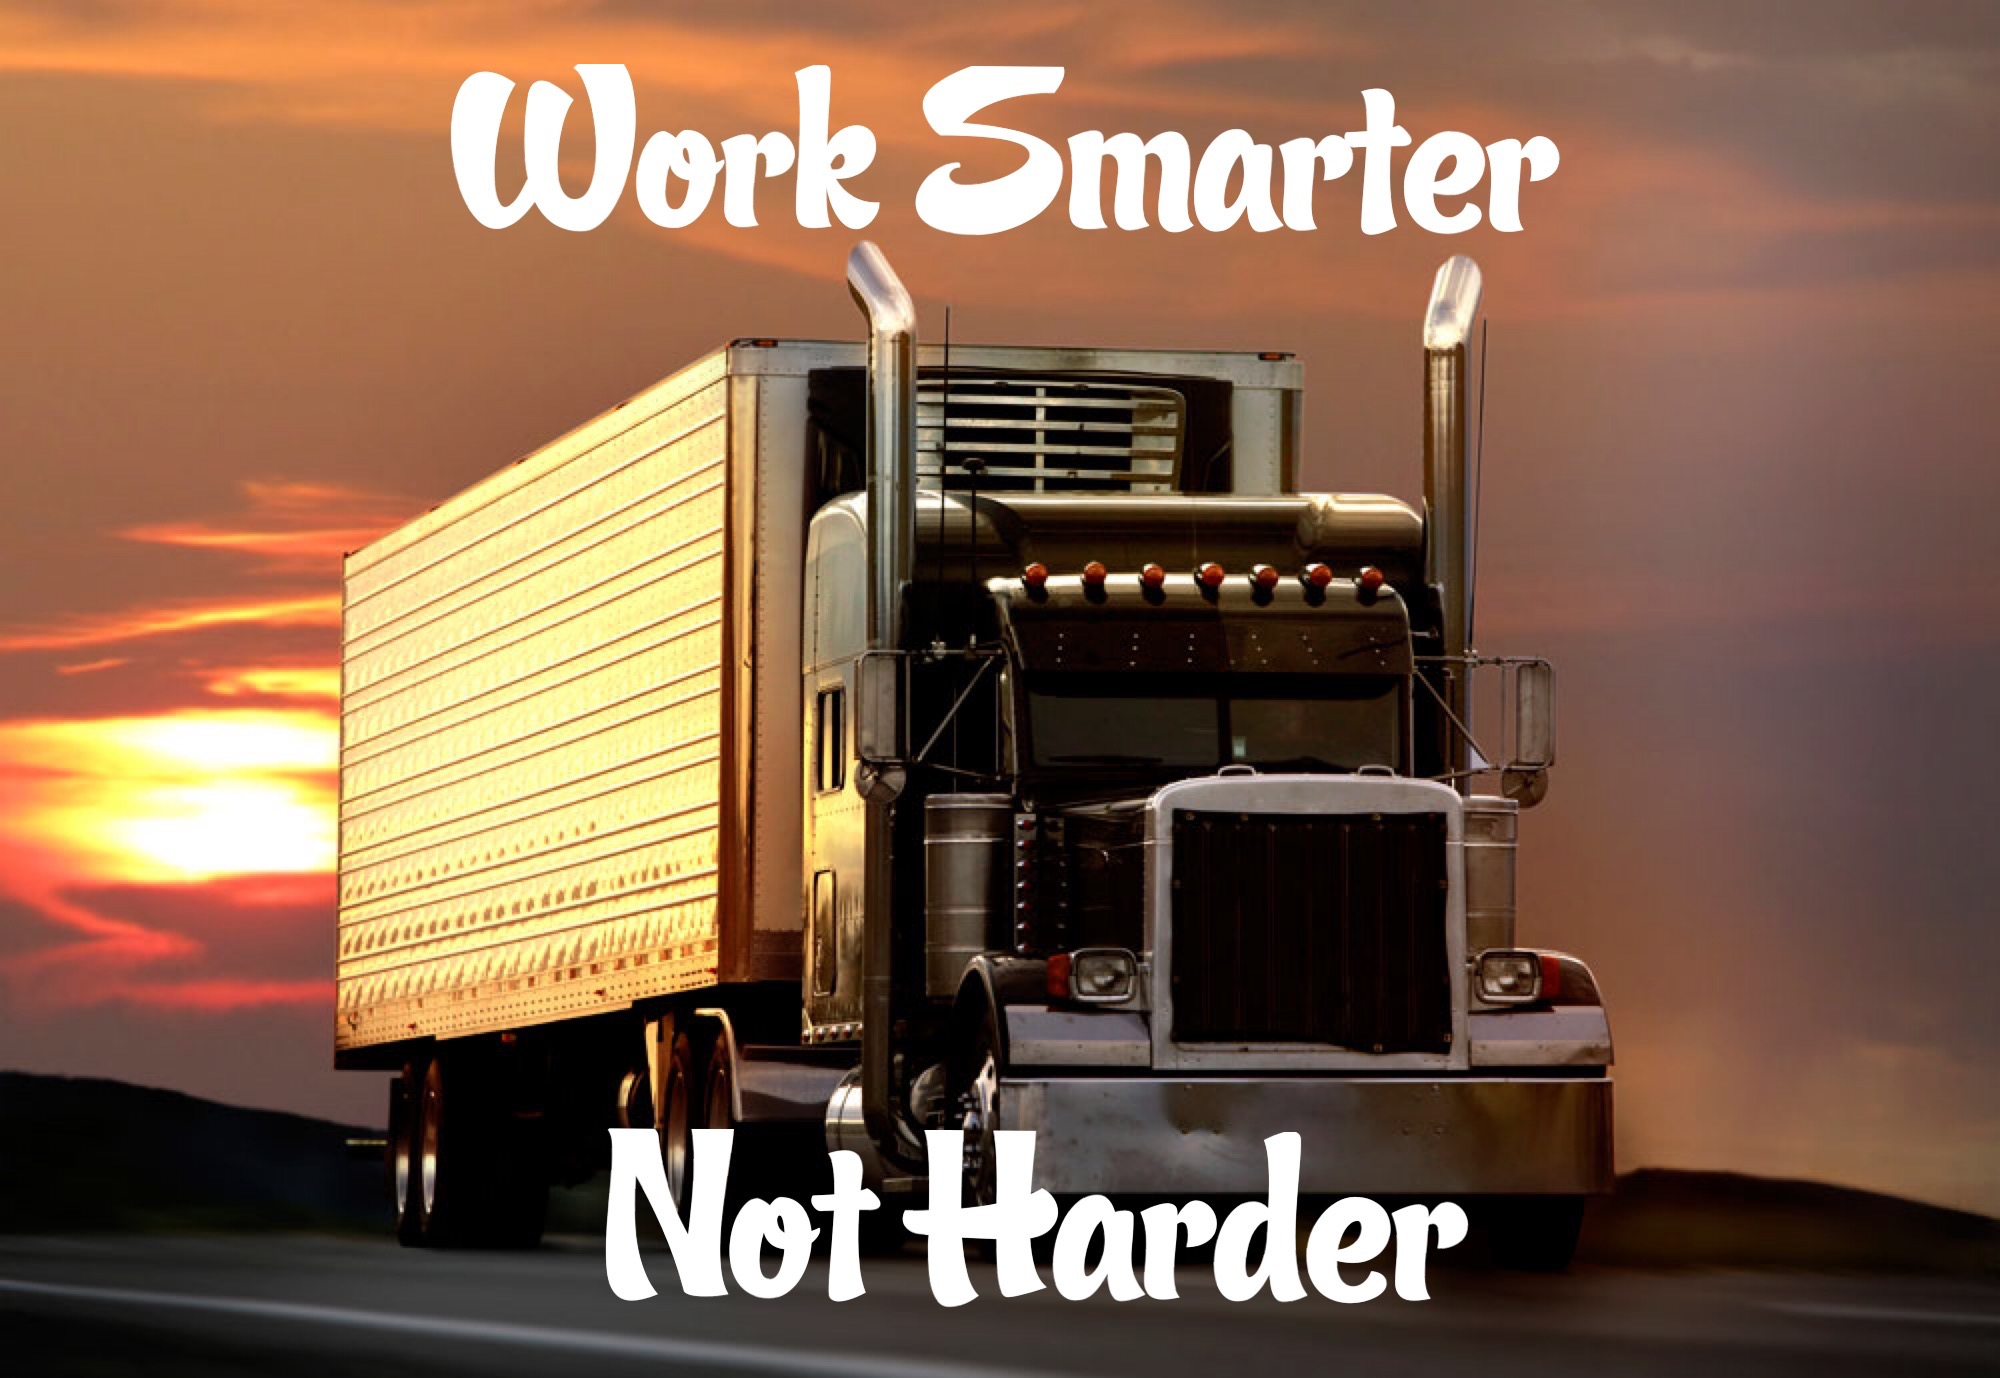 work smarter image